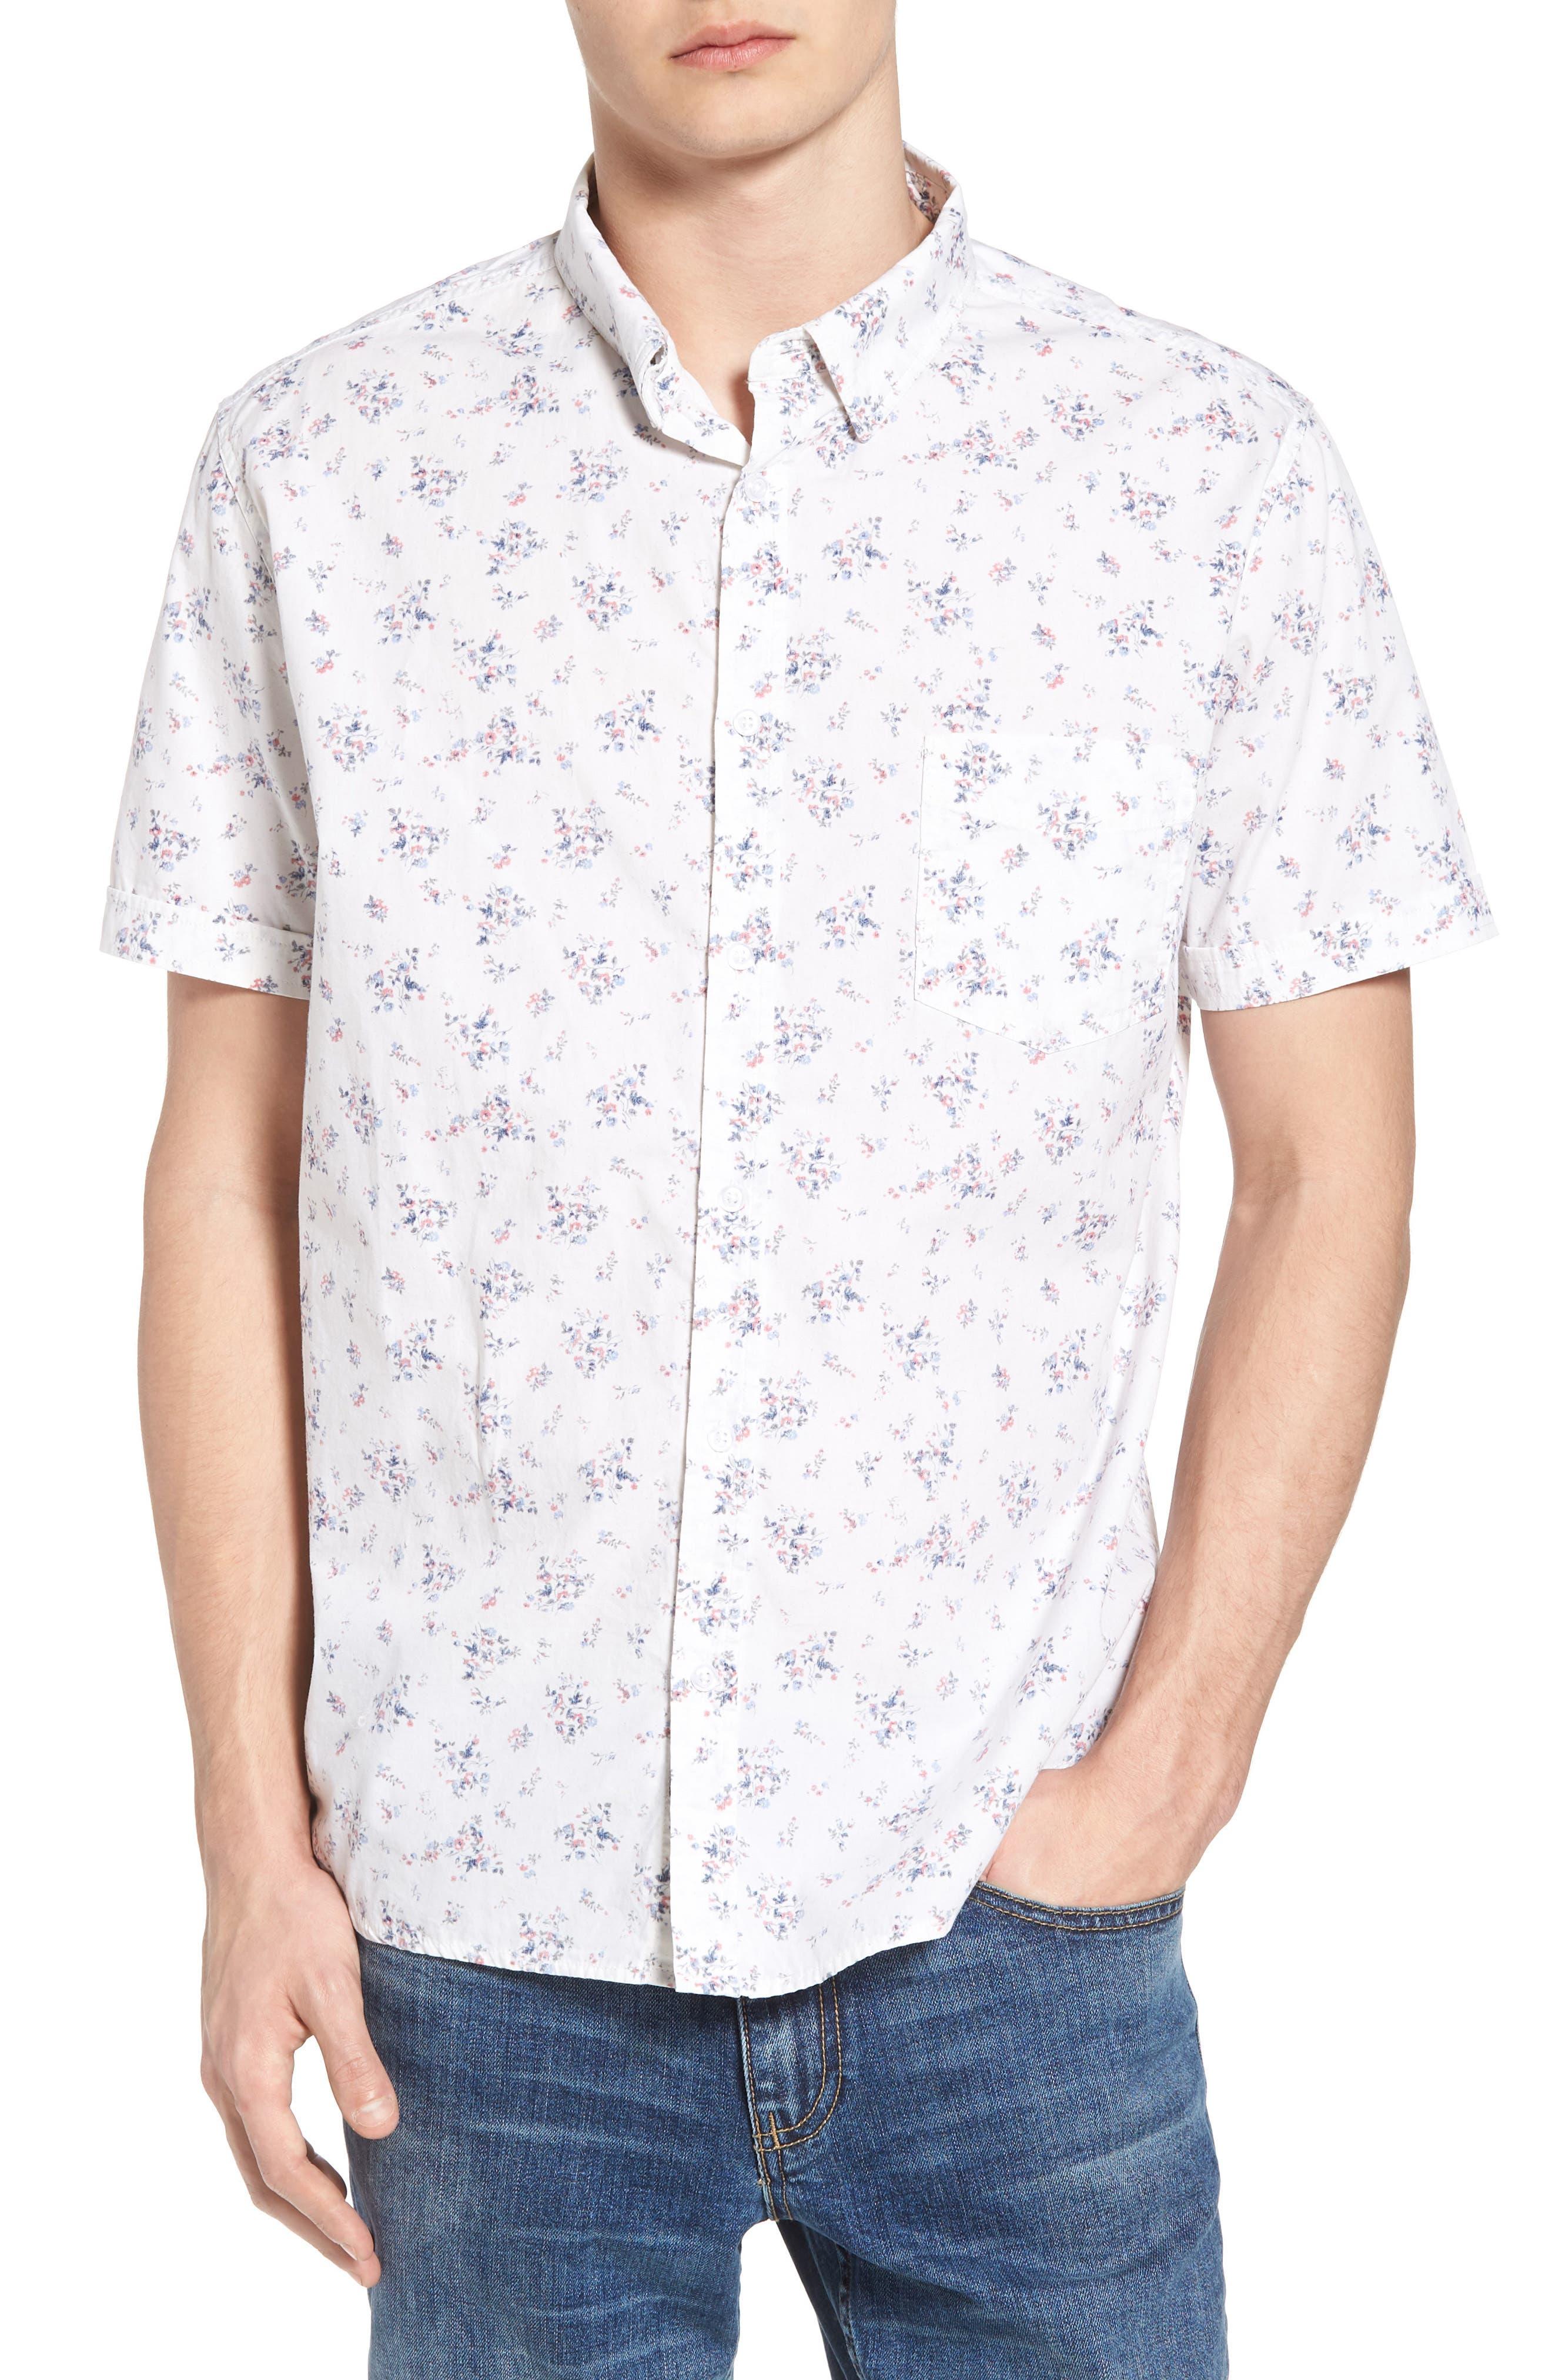 Carson Slim Fit Floral Print Sport Shirt,                             Main thumbnail 1, color,                             100